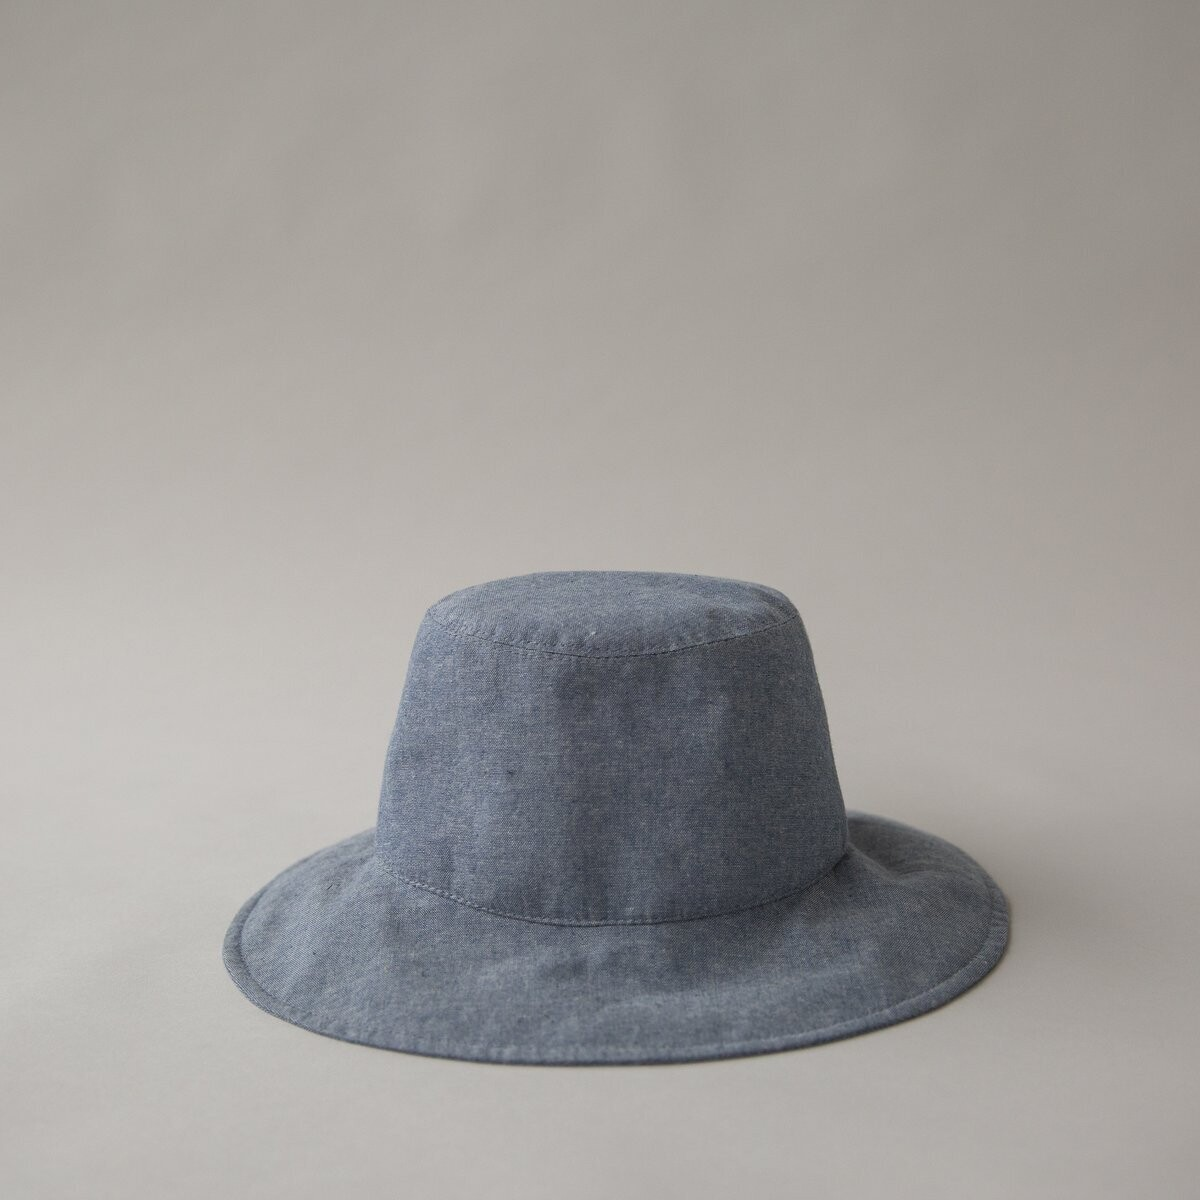 Cotton Bucket Cap - Denim